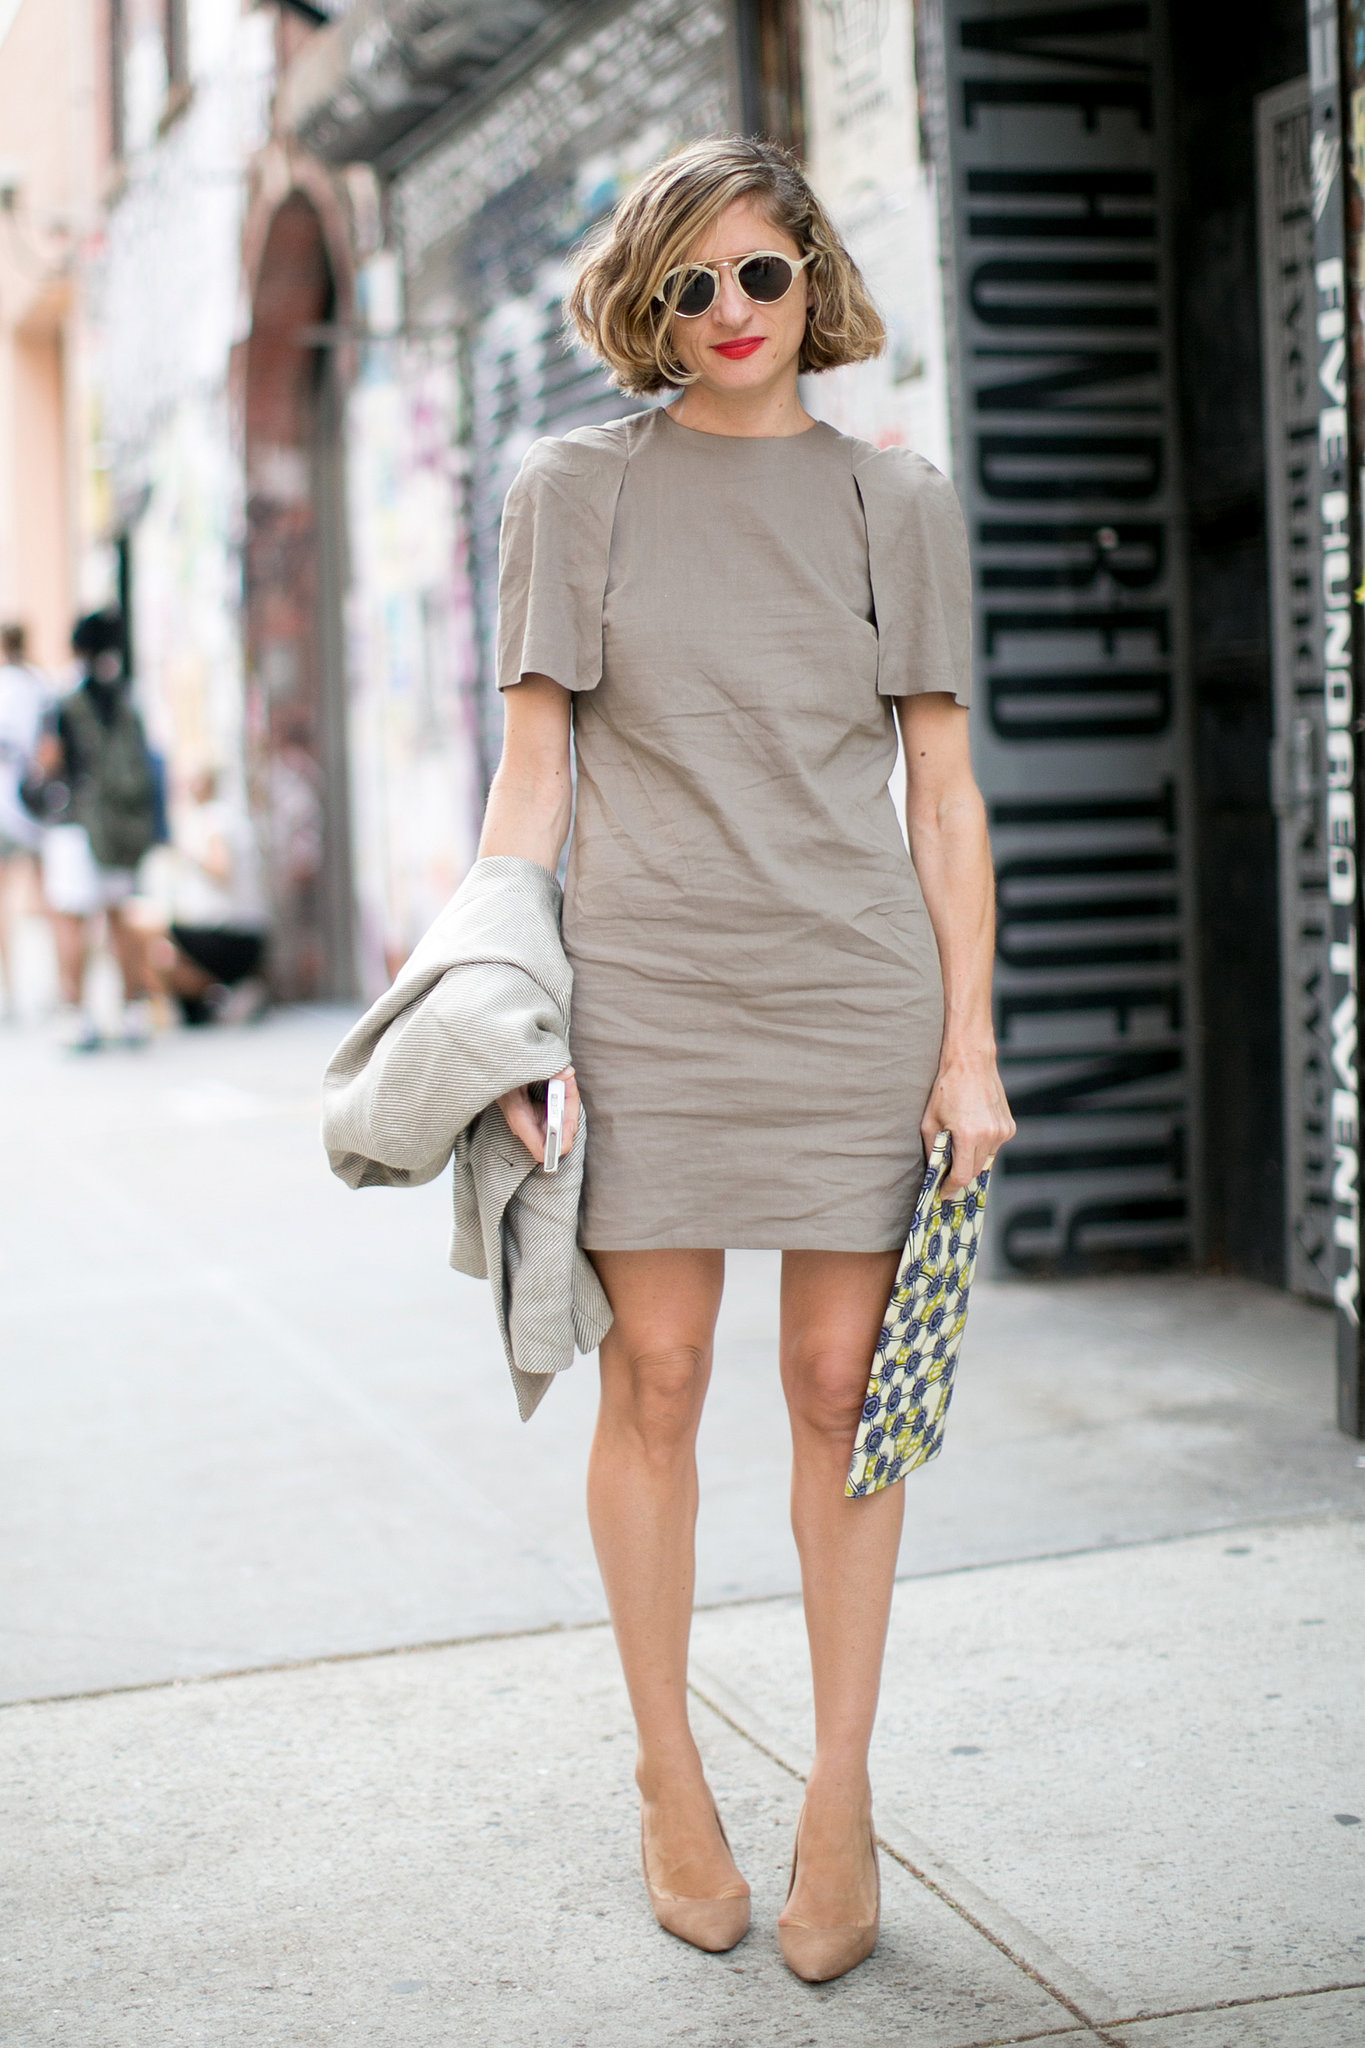 TOUT EN VOGUE!: Hot Shots: The Best Street Style at NYFW ...